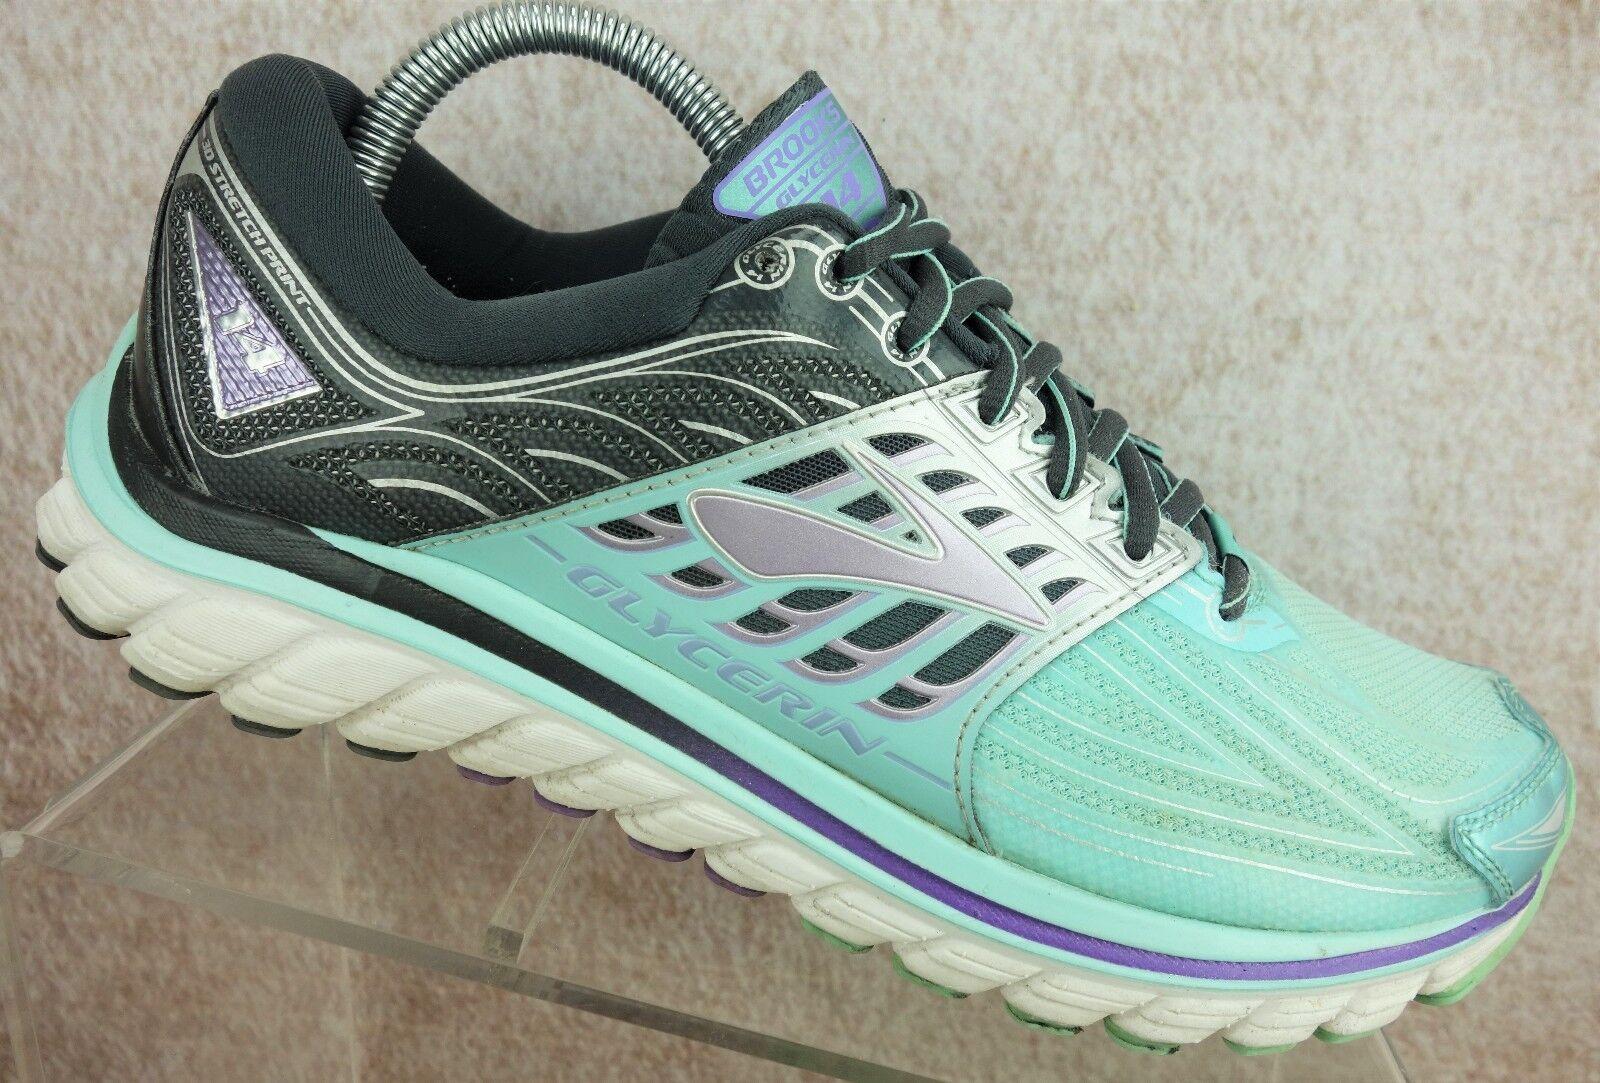 Brooks Glycerin 14 Gray Teal Nylon Running Athletic Sneaker Shoes Womens 9.5 B